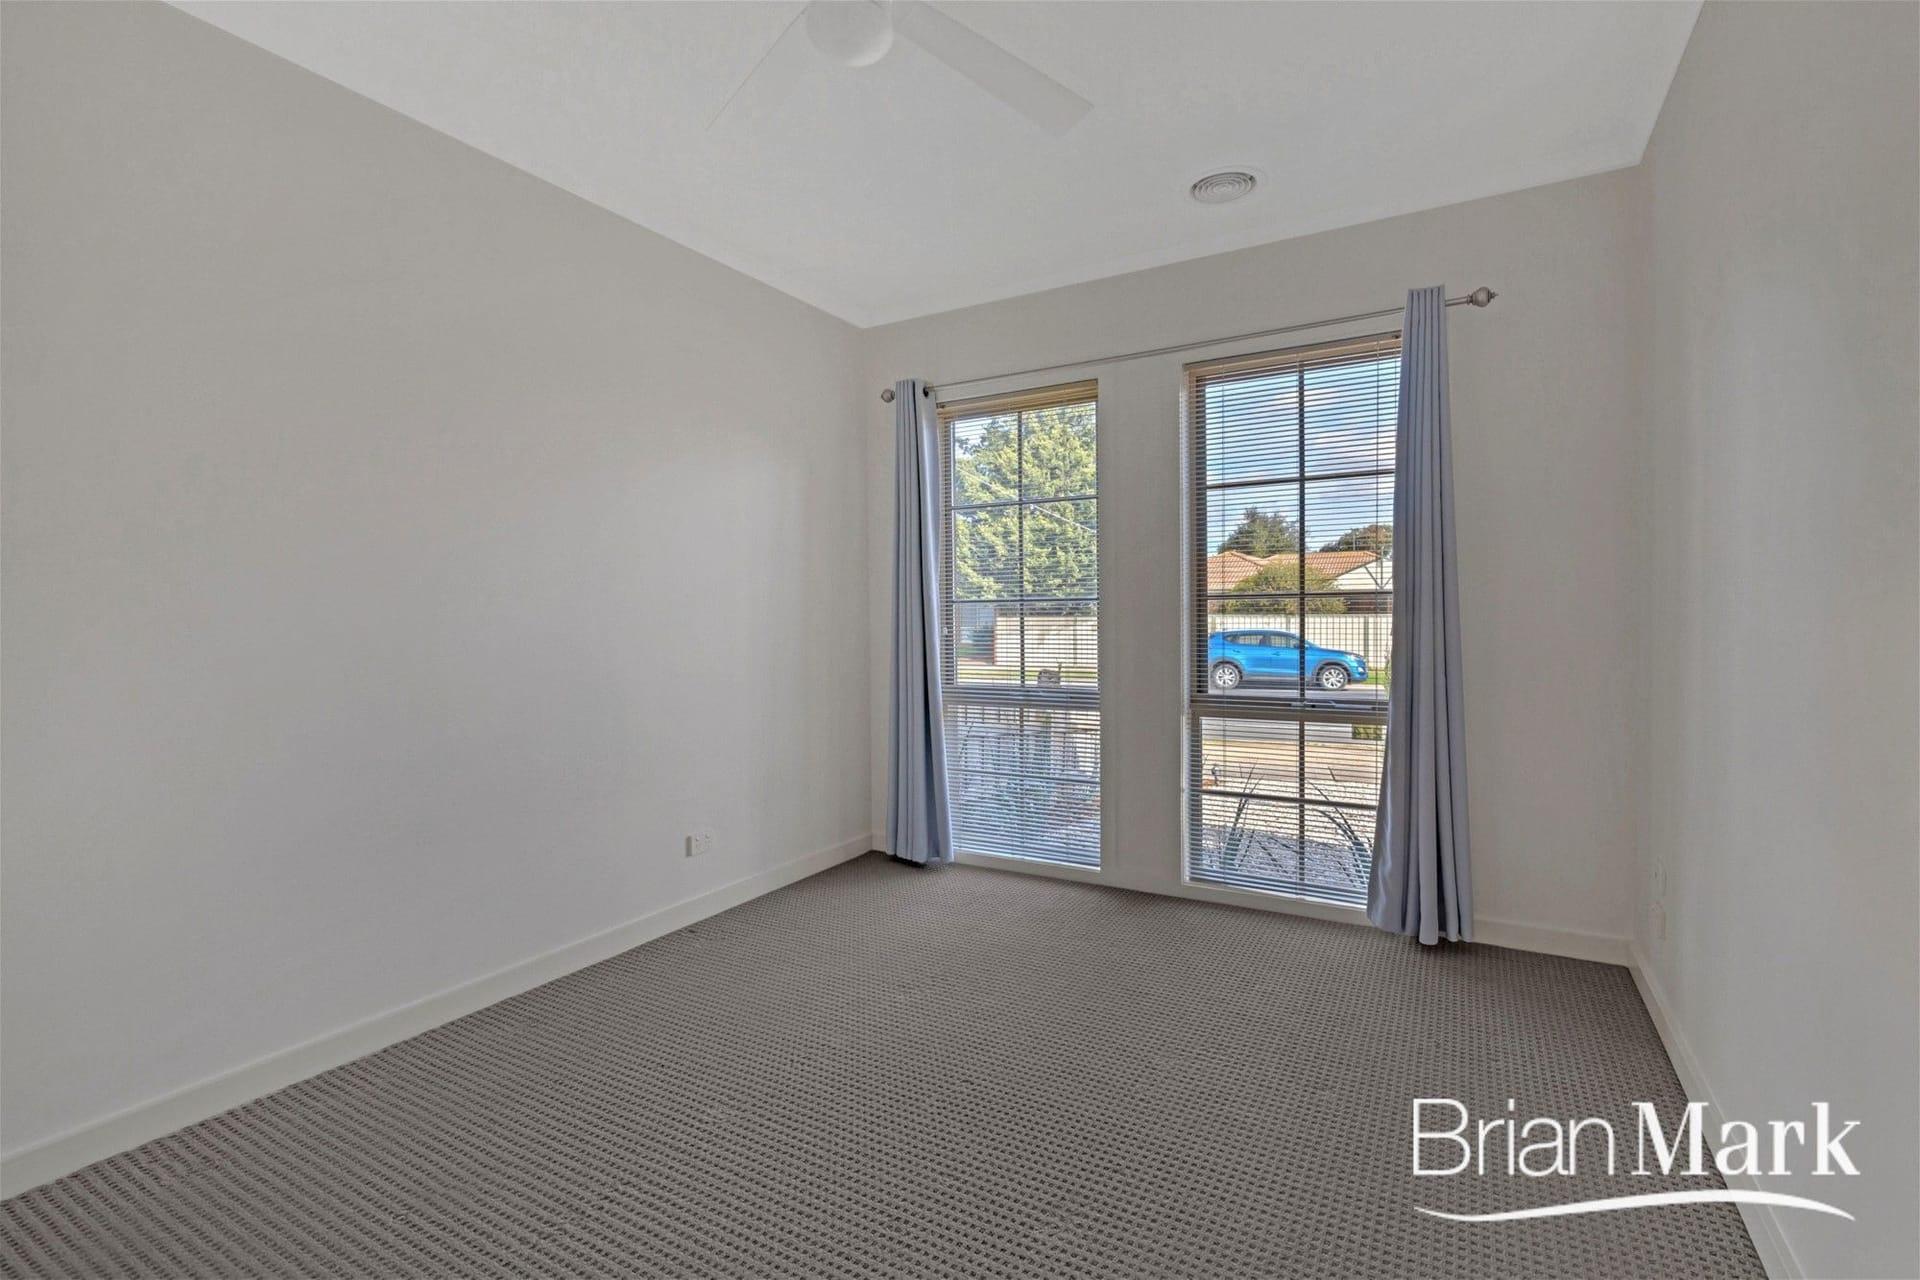 Property 1/274 Greaves Street North, WERRIBEE VIC 3030 IMAGE